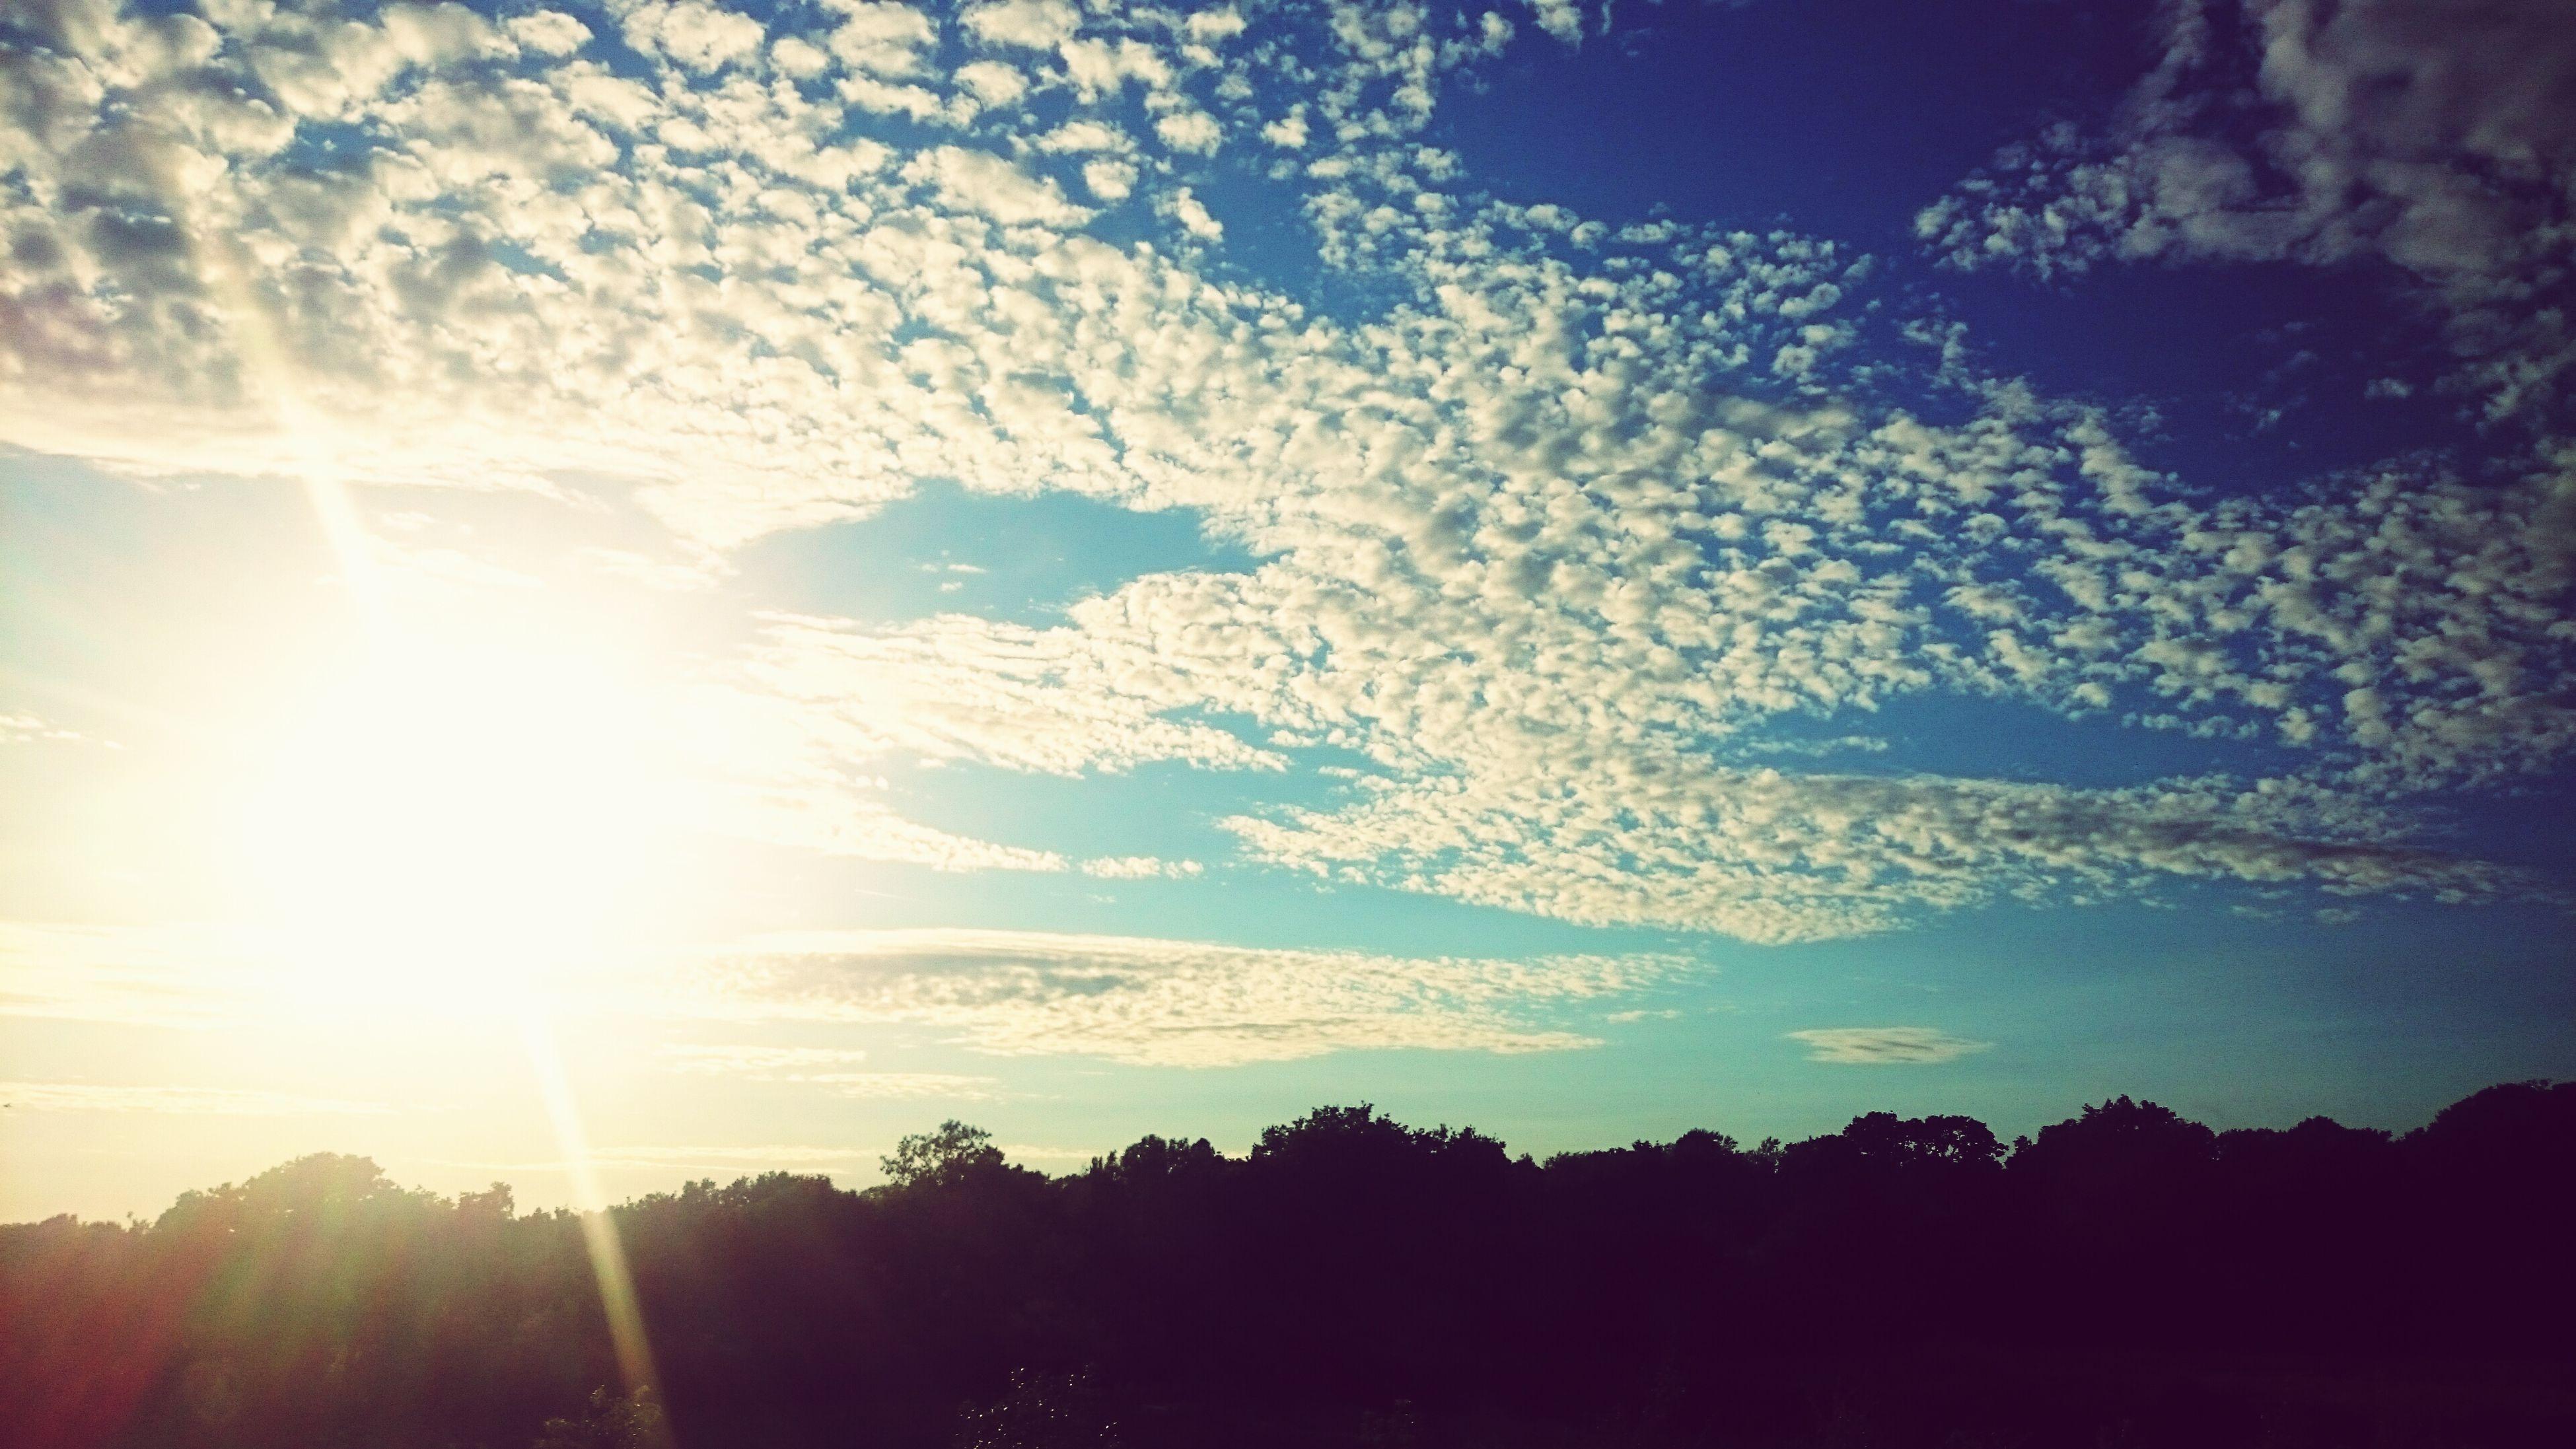 sun, sunbeam, silhouette, sunlight, tranquility, tranquil scene, scenics, beauty in nature, sky, lens flare, sunset, tree, nature, landscape, cloud - sky, idyllic, bright, low angle view, non-urban scene, cloud